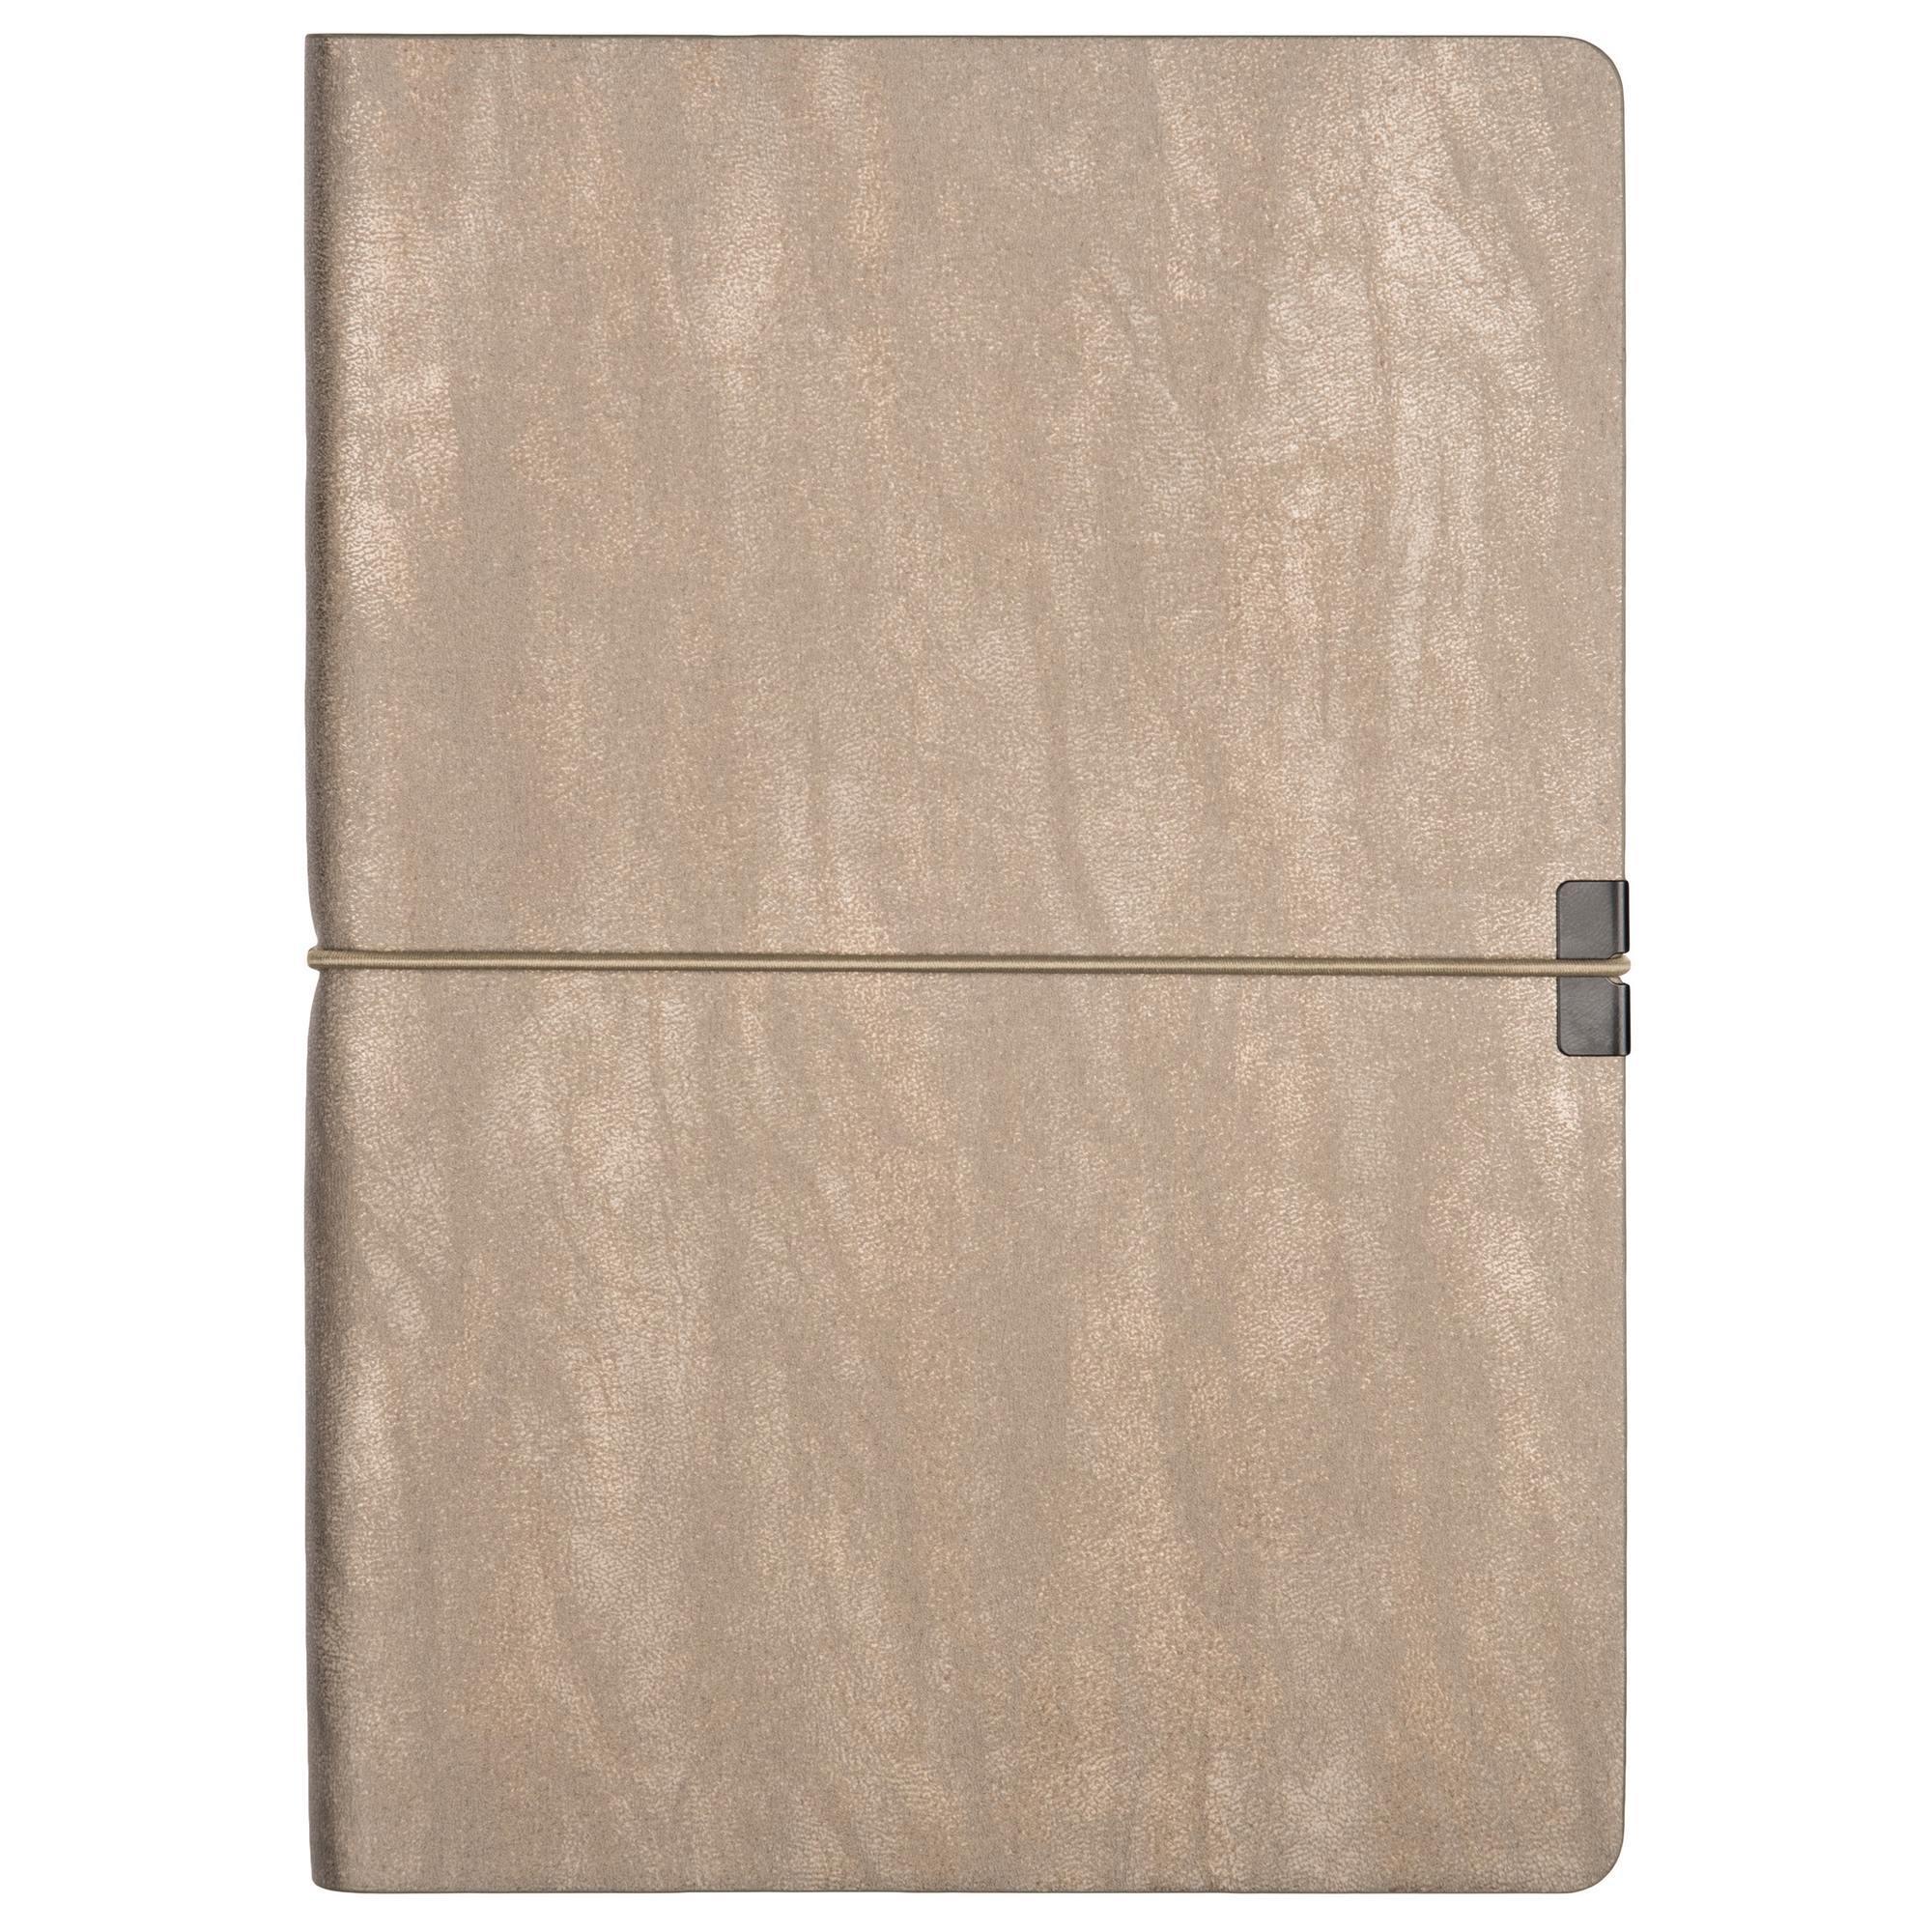 Ежедневник недатированный, Portobello Trend, Velour , 145х210, 256 стр, бежевый